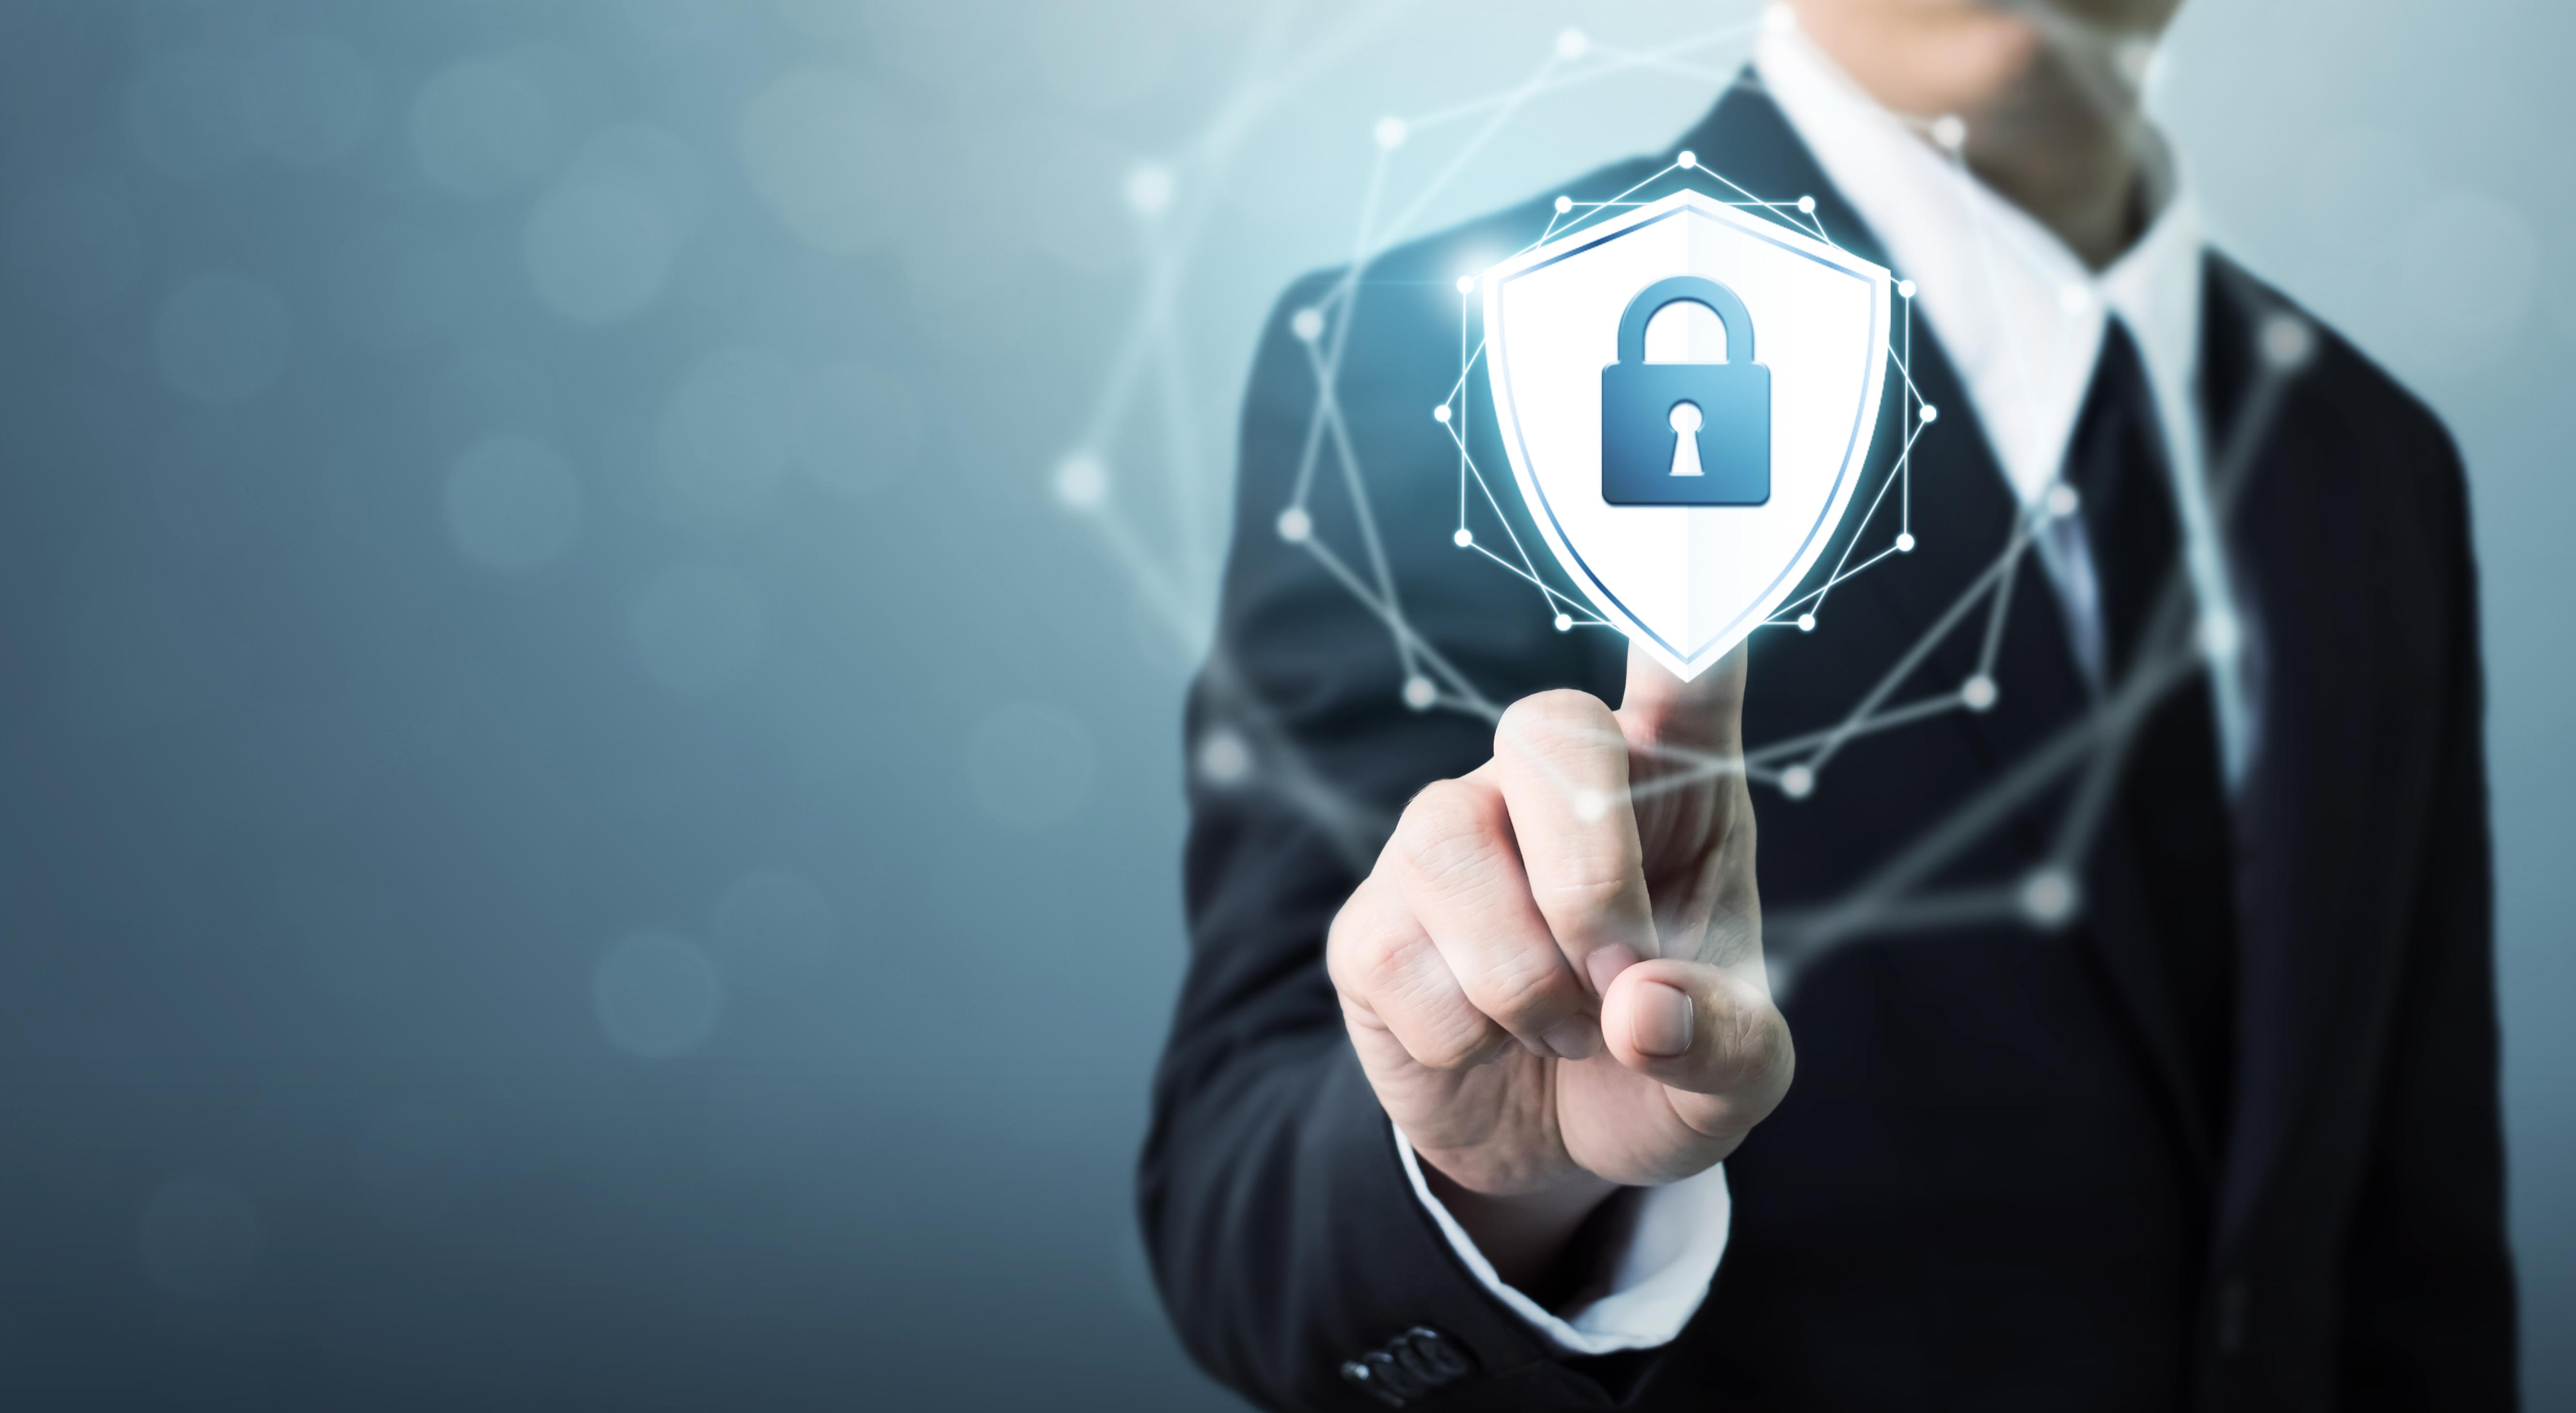 Keep Amazon S3 Data Private with GoodSync – GoodSync Blog